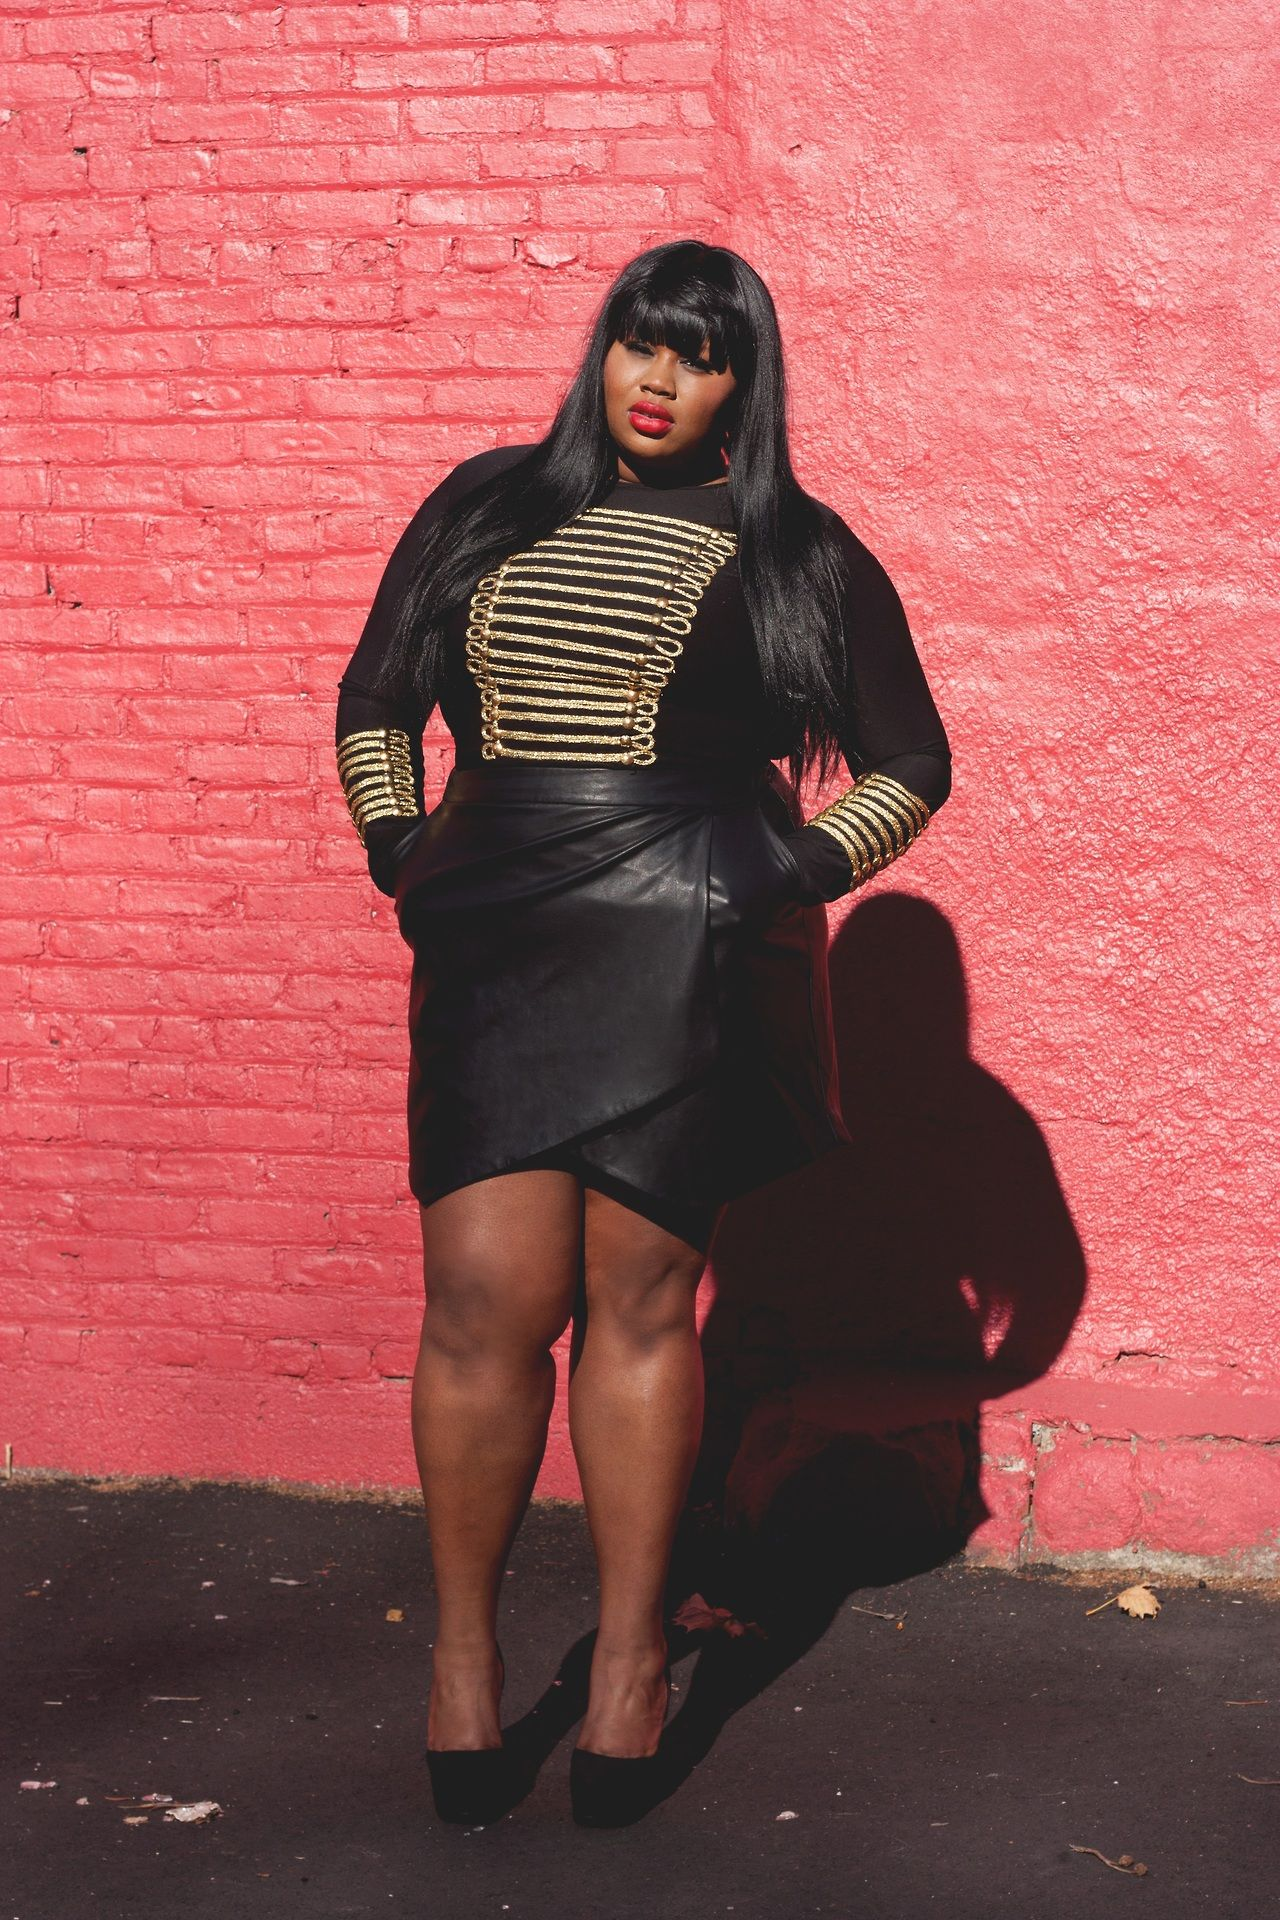 Blackfashion Blog Facebook Puksies Wardrobe Tumblr: #BBBG On Facebook BBBGirls4ever On Instagram